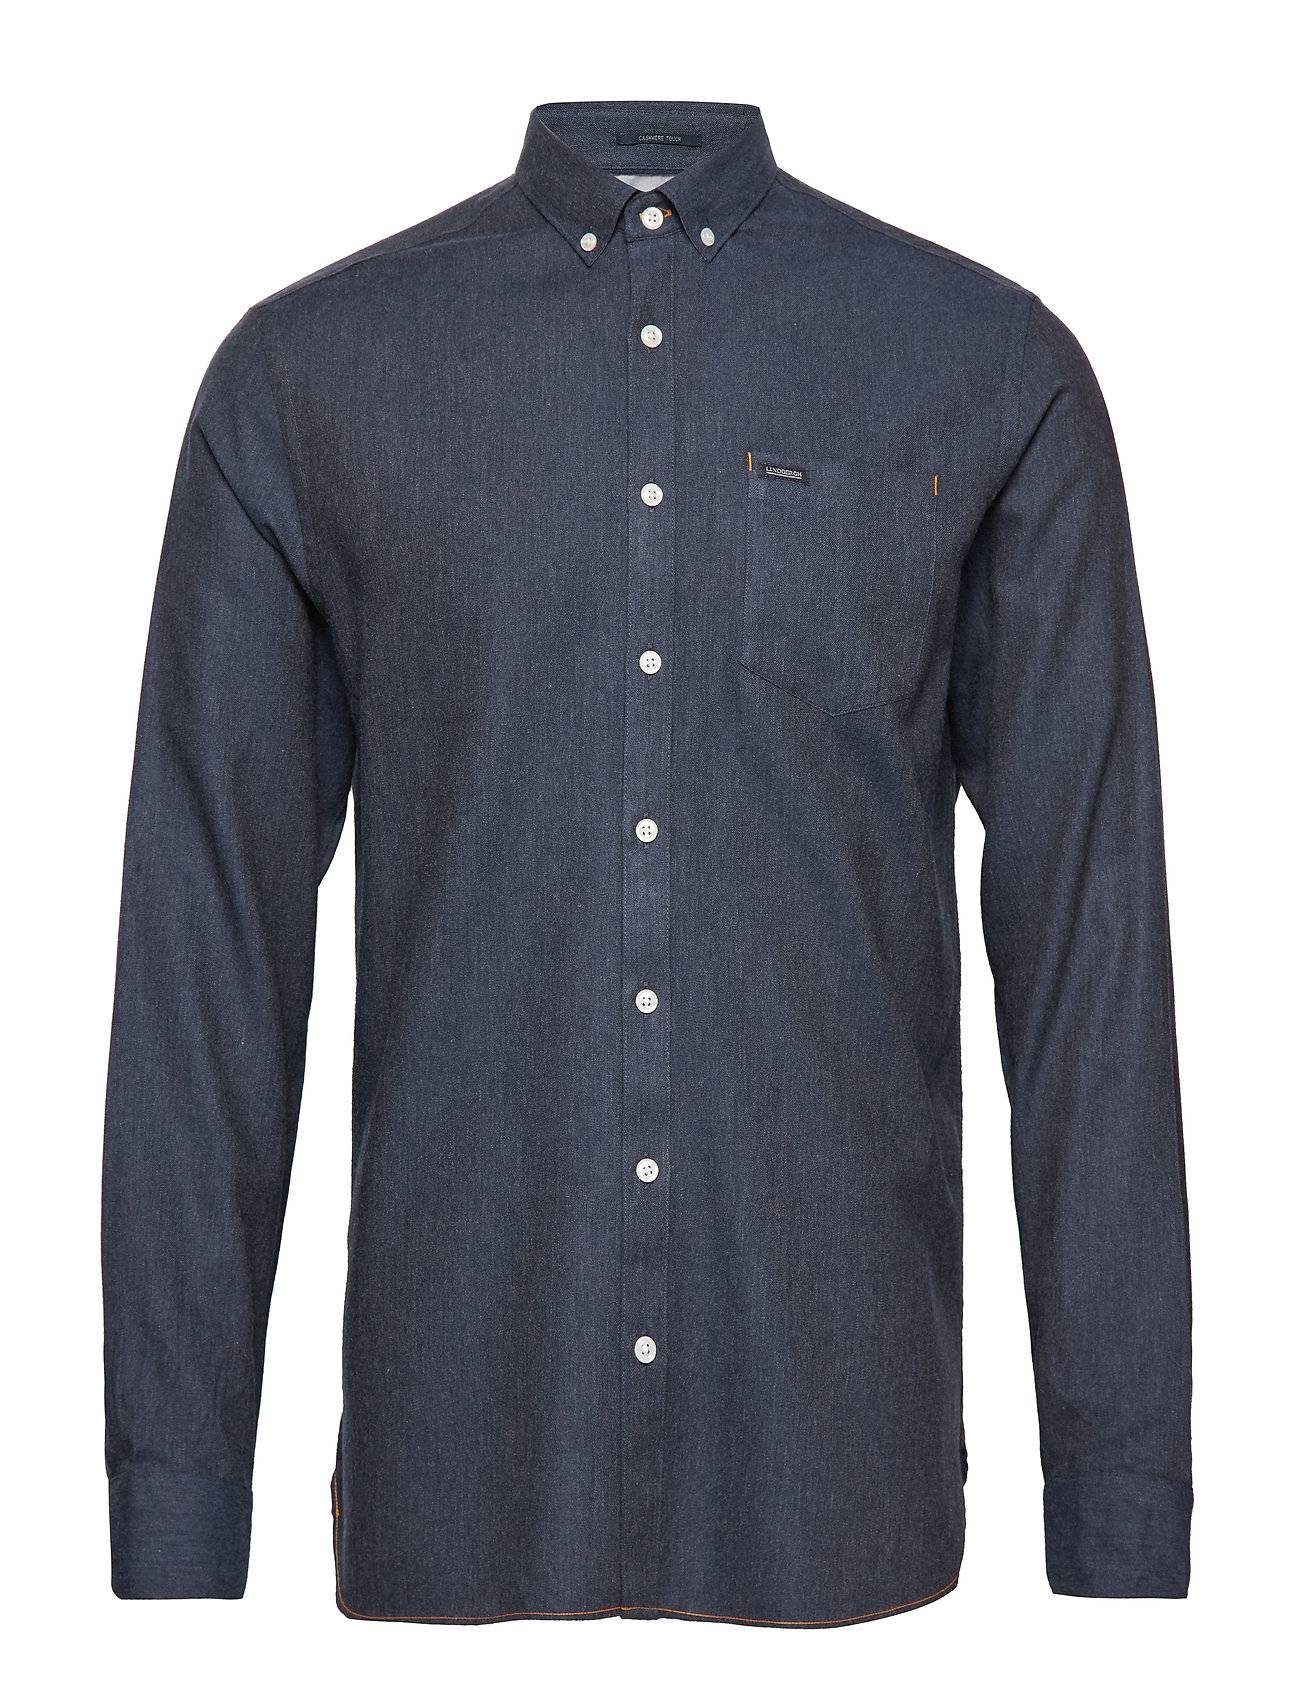 Lindbergh Cashmere Touch L/S Shirt